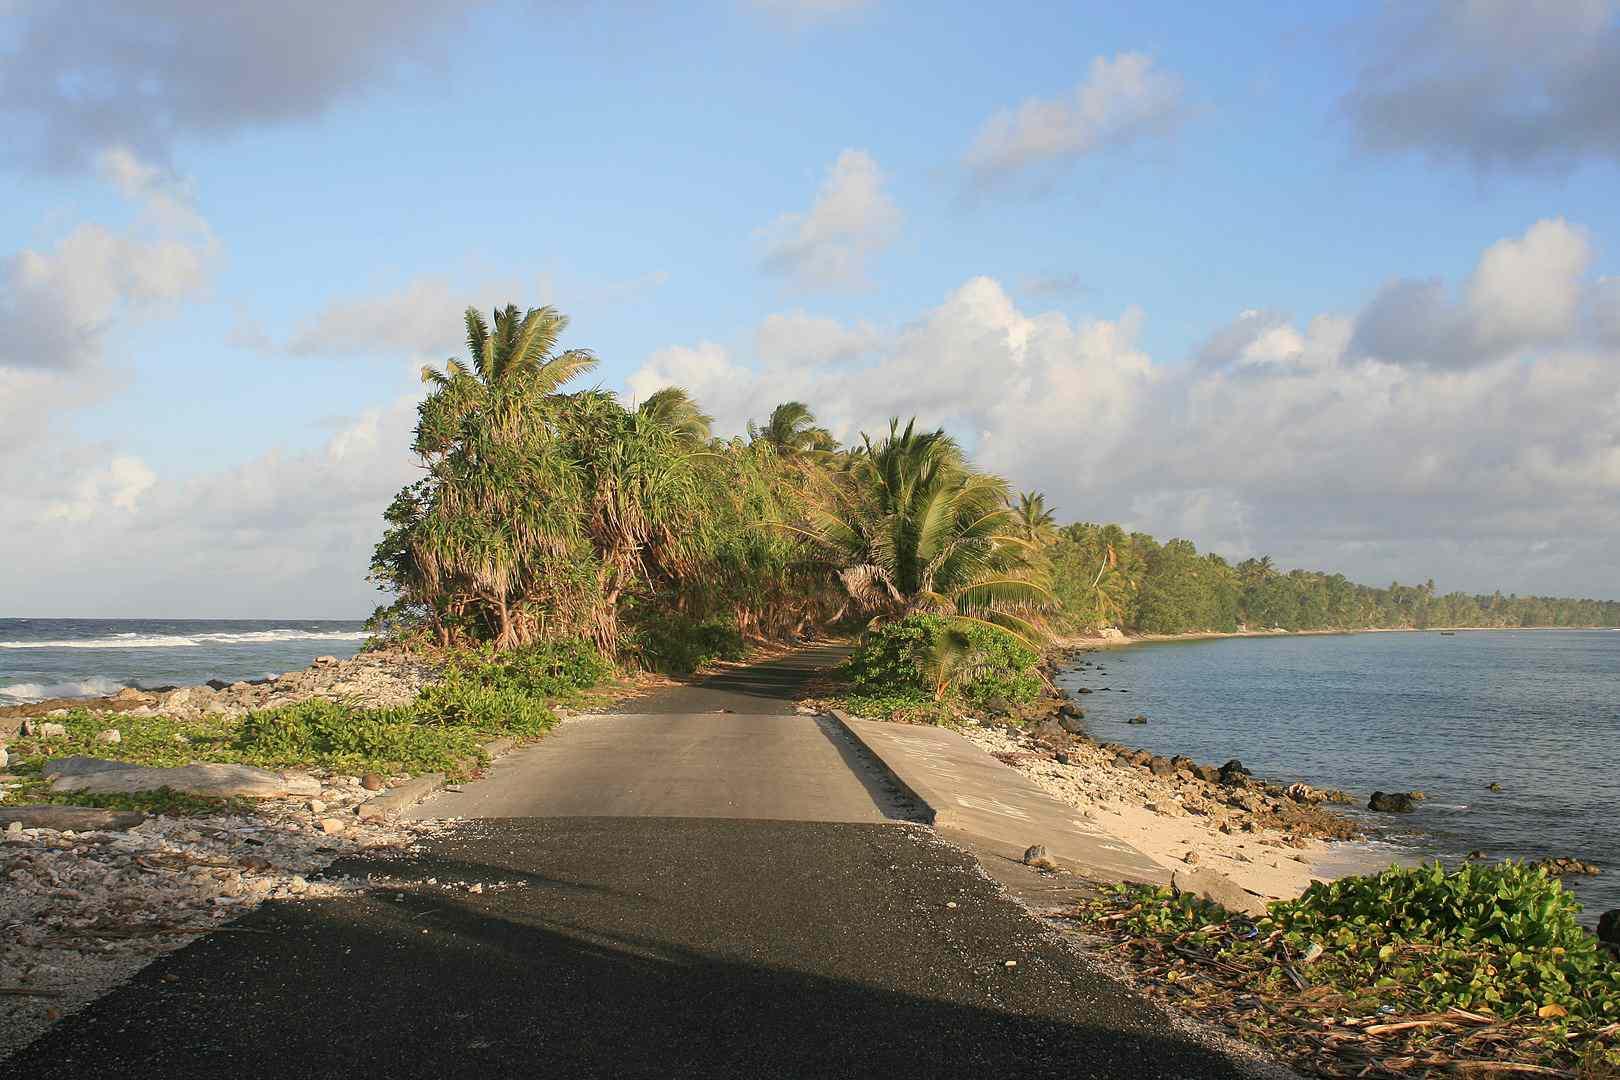 Tuvalu in the Pacific Ocean